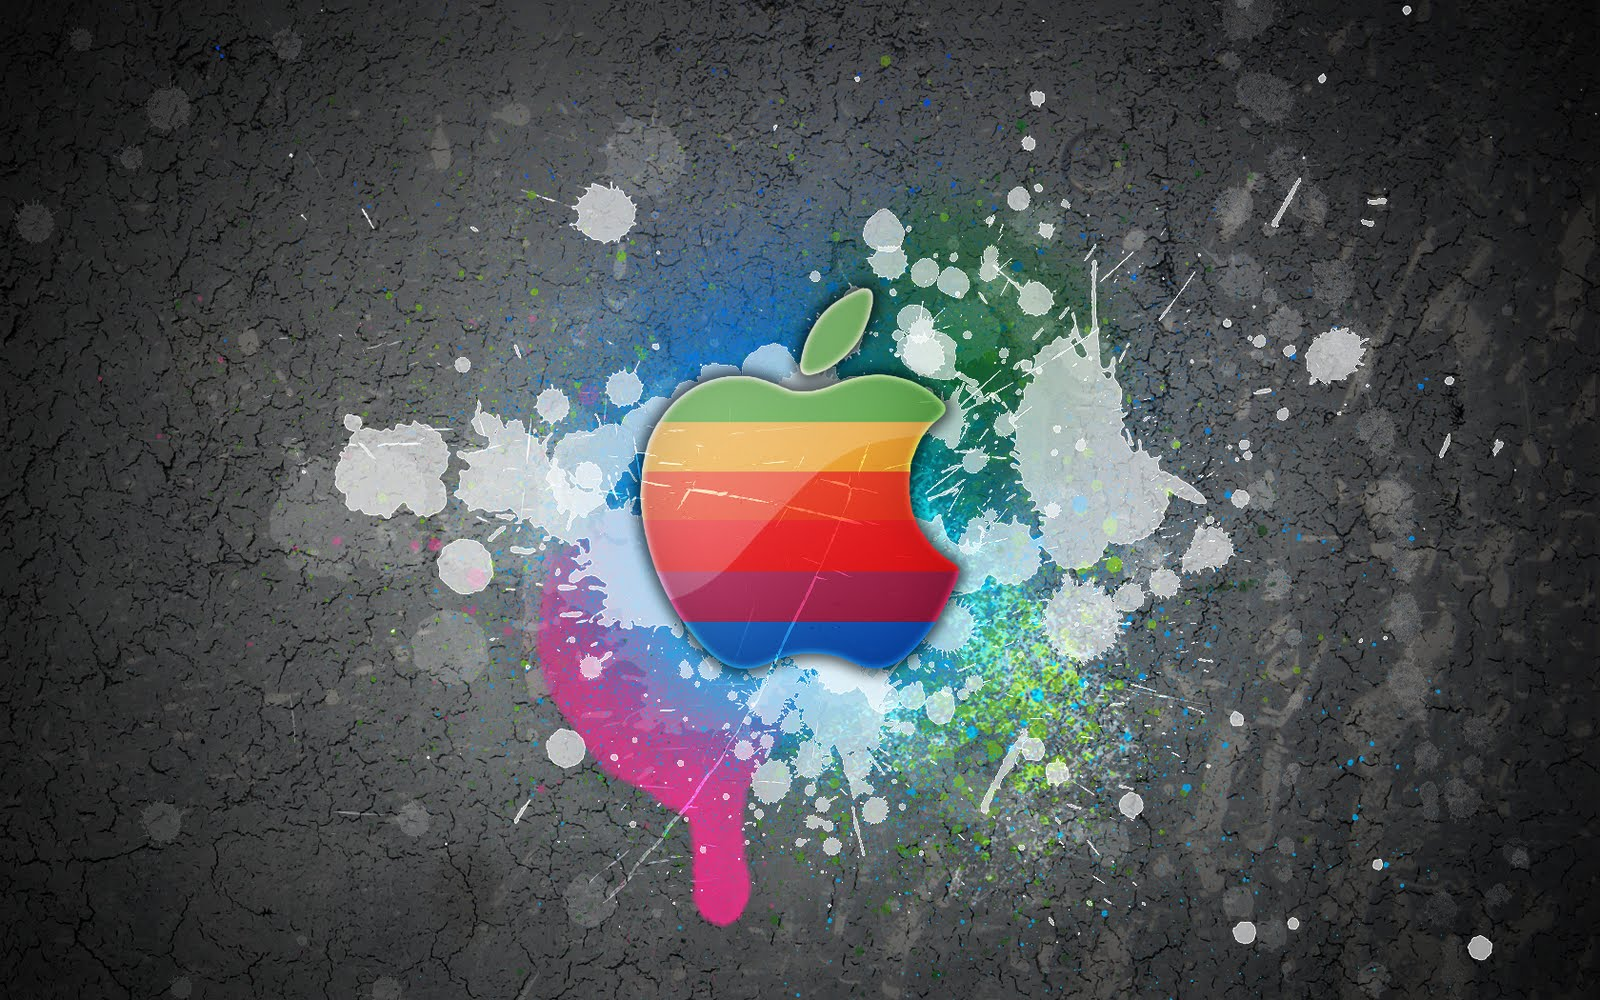 apple wallpaper desktop black apple wallpaper apple mac wallpaper 1600x1000